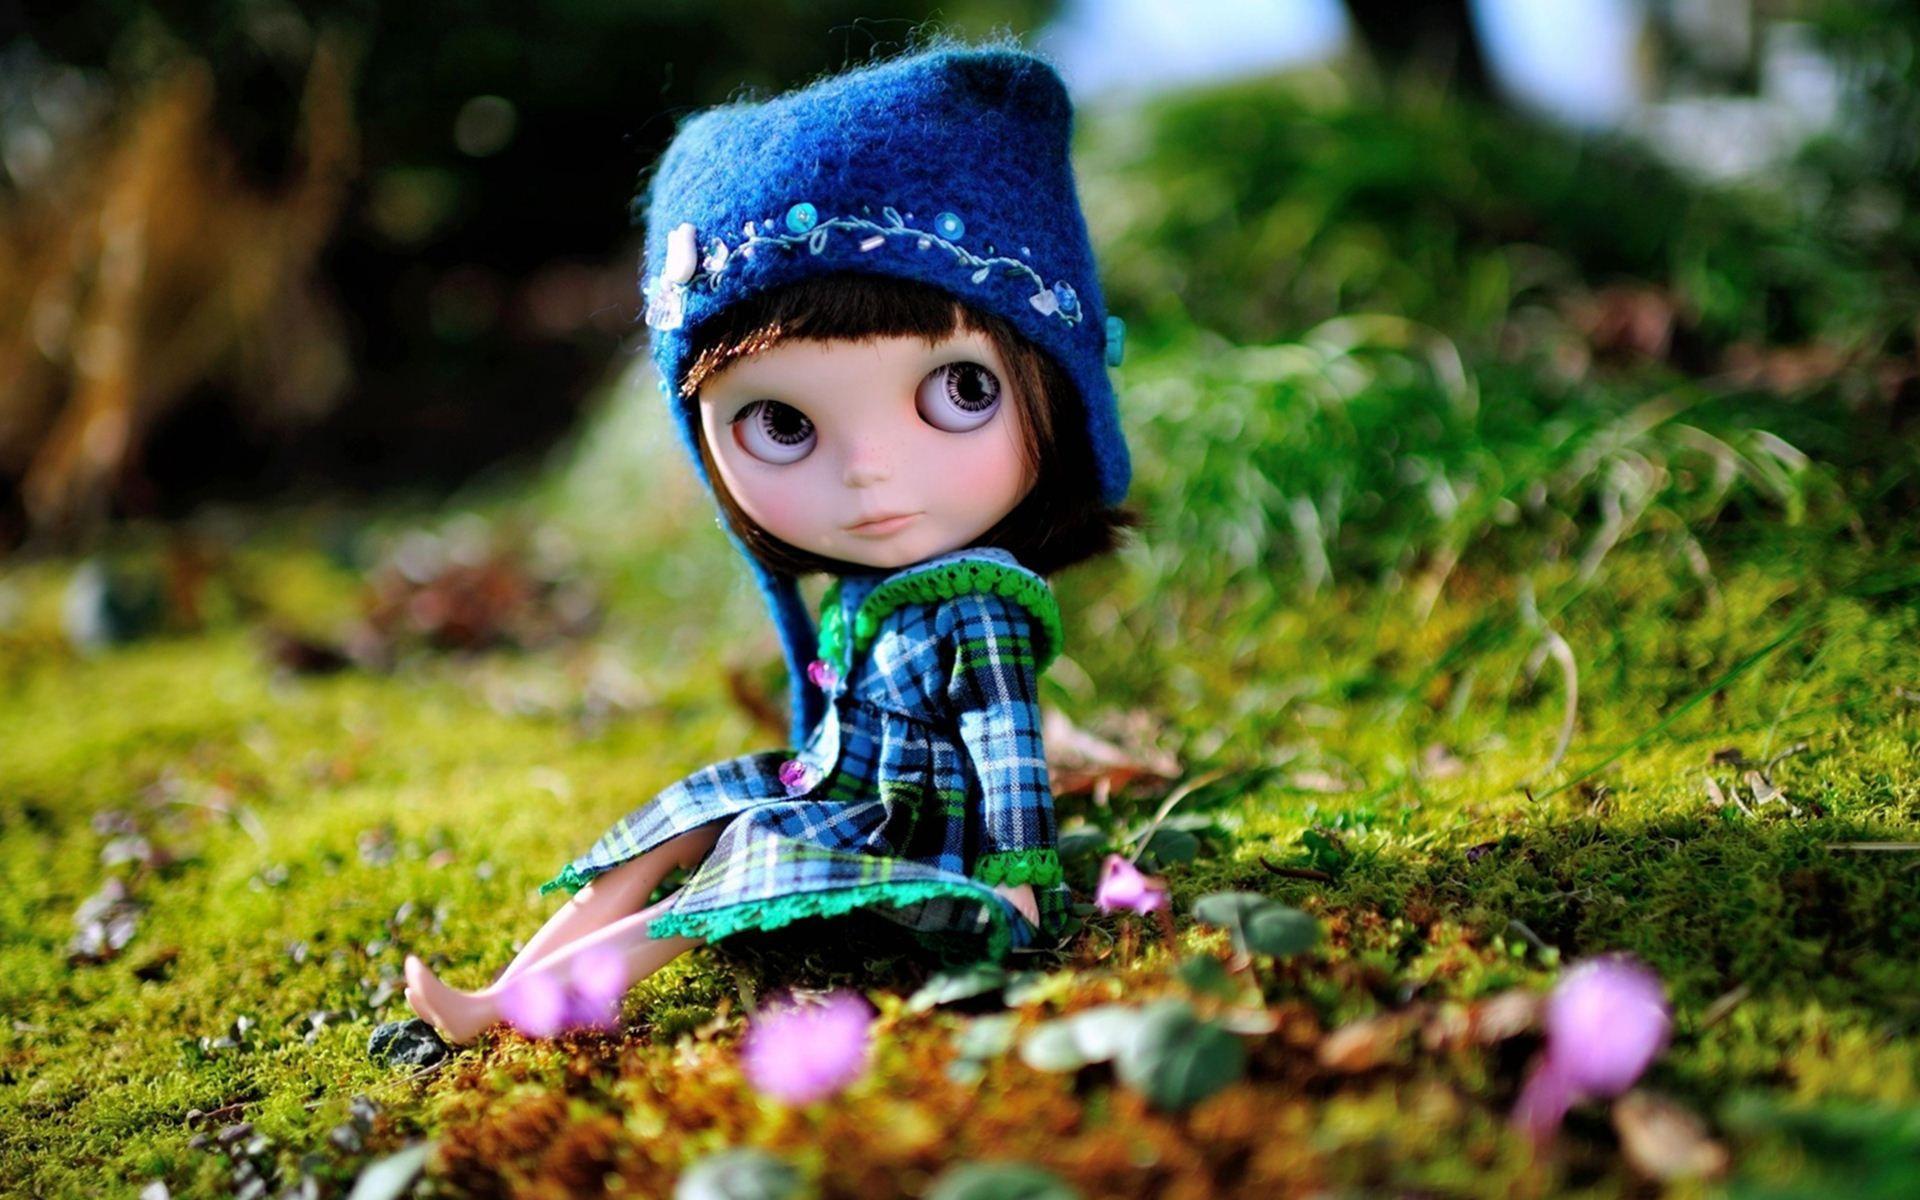 Wonderful Toy Doll Wallpaper 6816268 Cute Girl Wallpaper Photography Wallpaper Cute Dolls